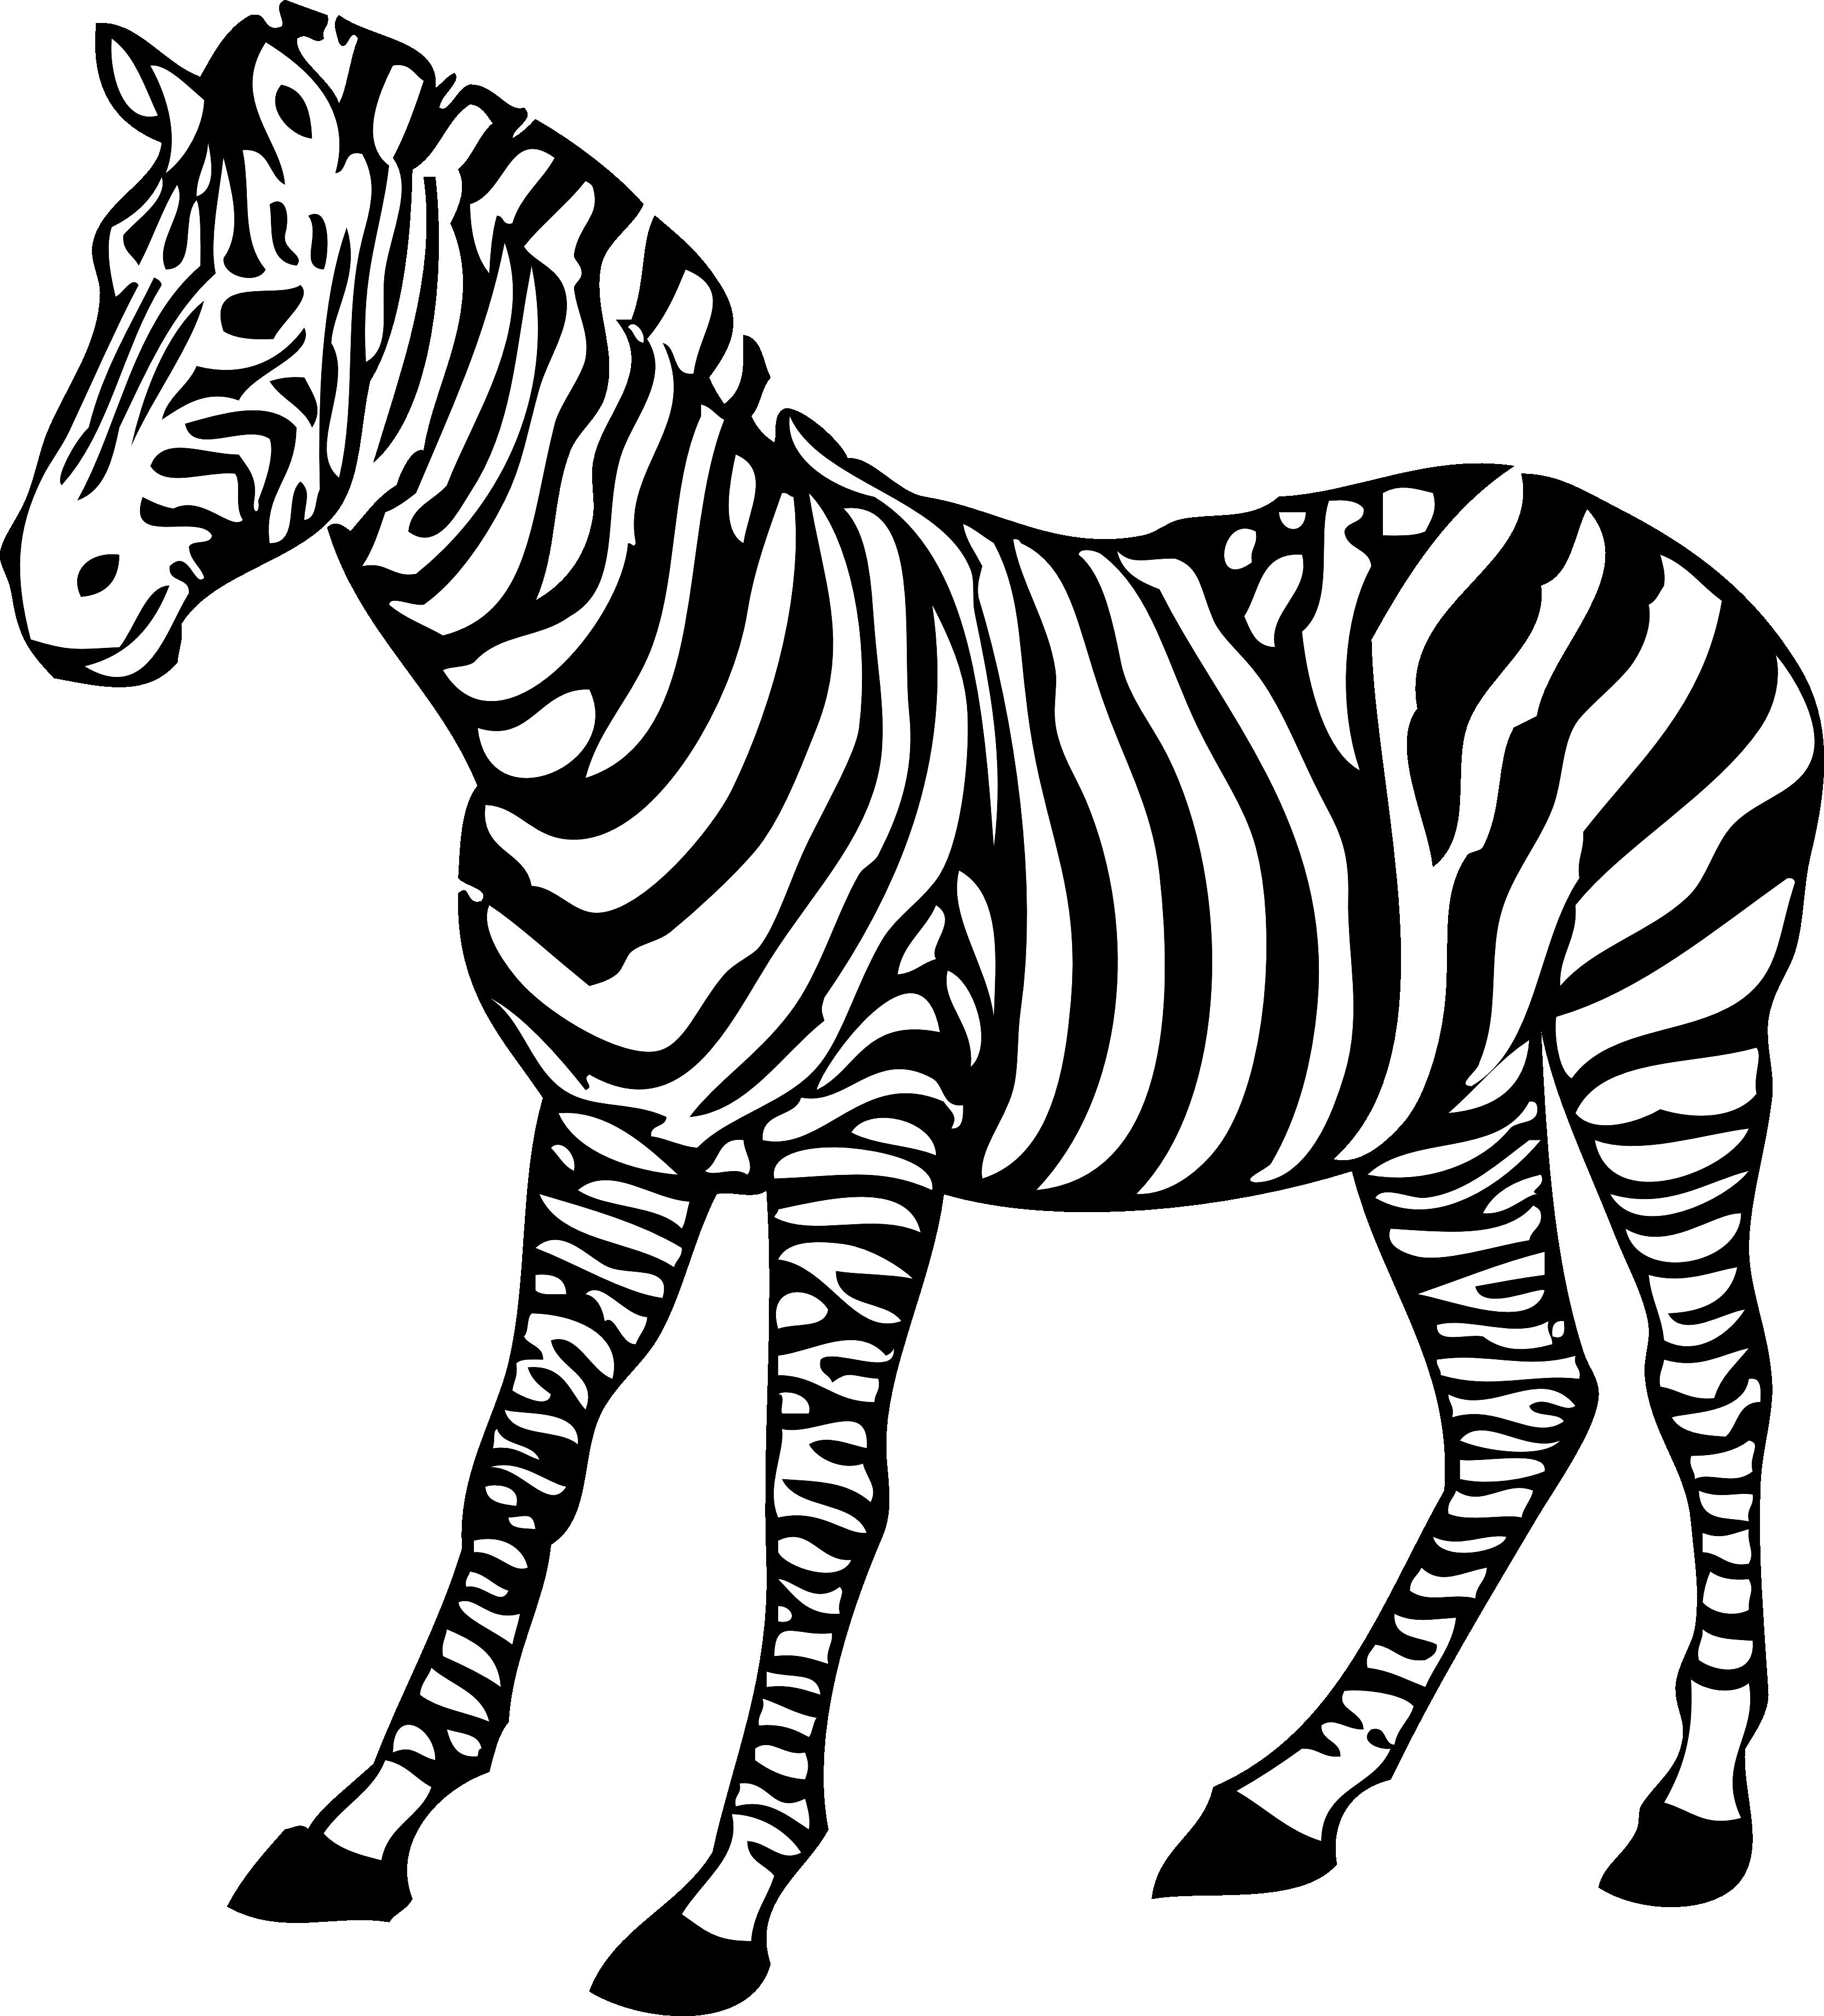 Hdpng - Zebra, Transparent background PNG HD thumbnail